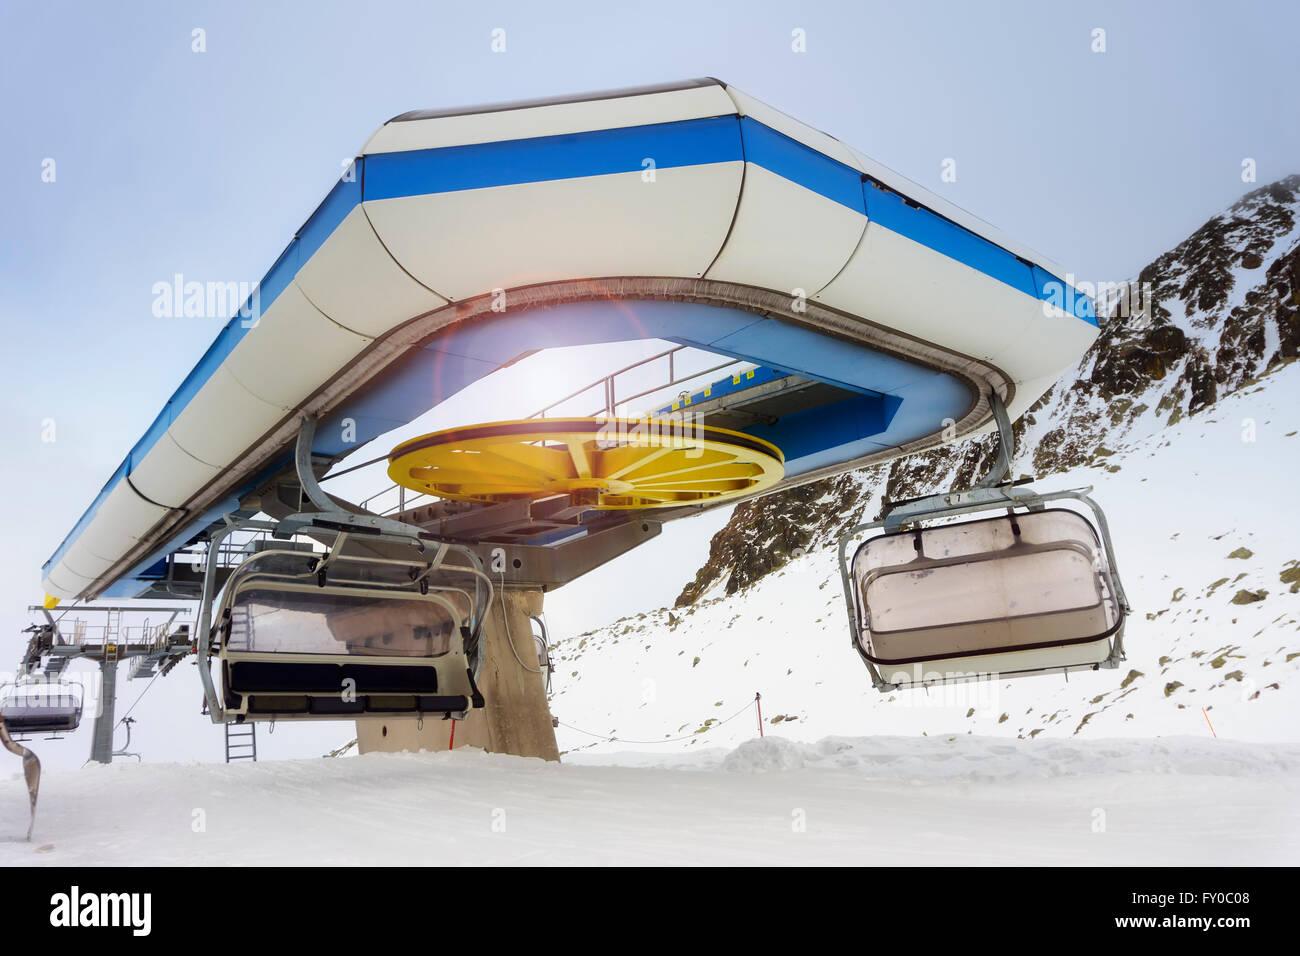 chair lift on ski slope - Stock Image